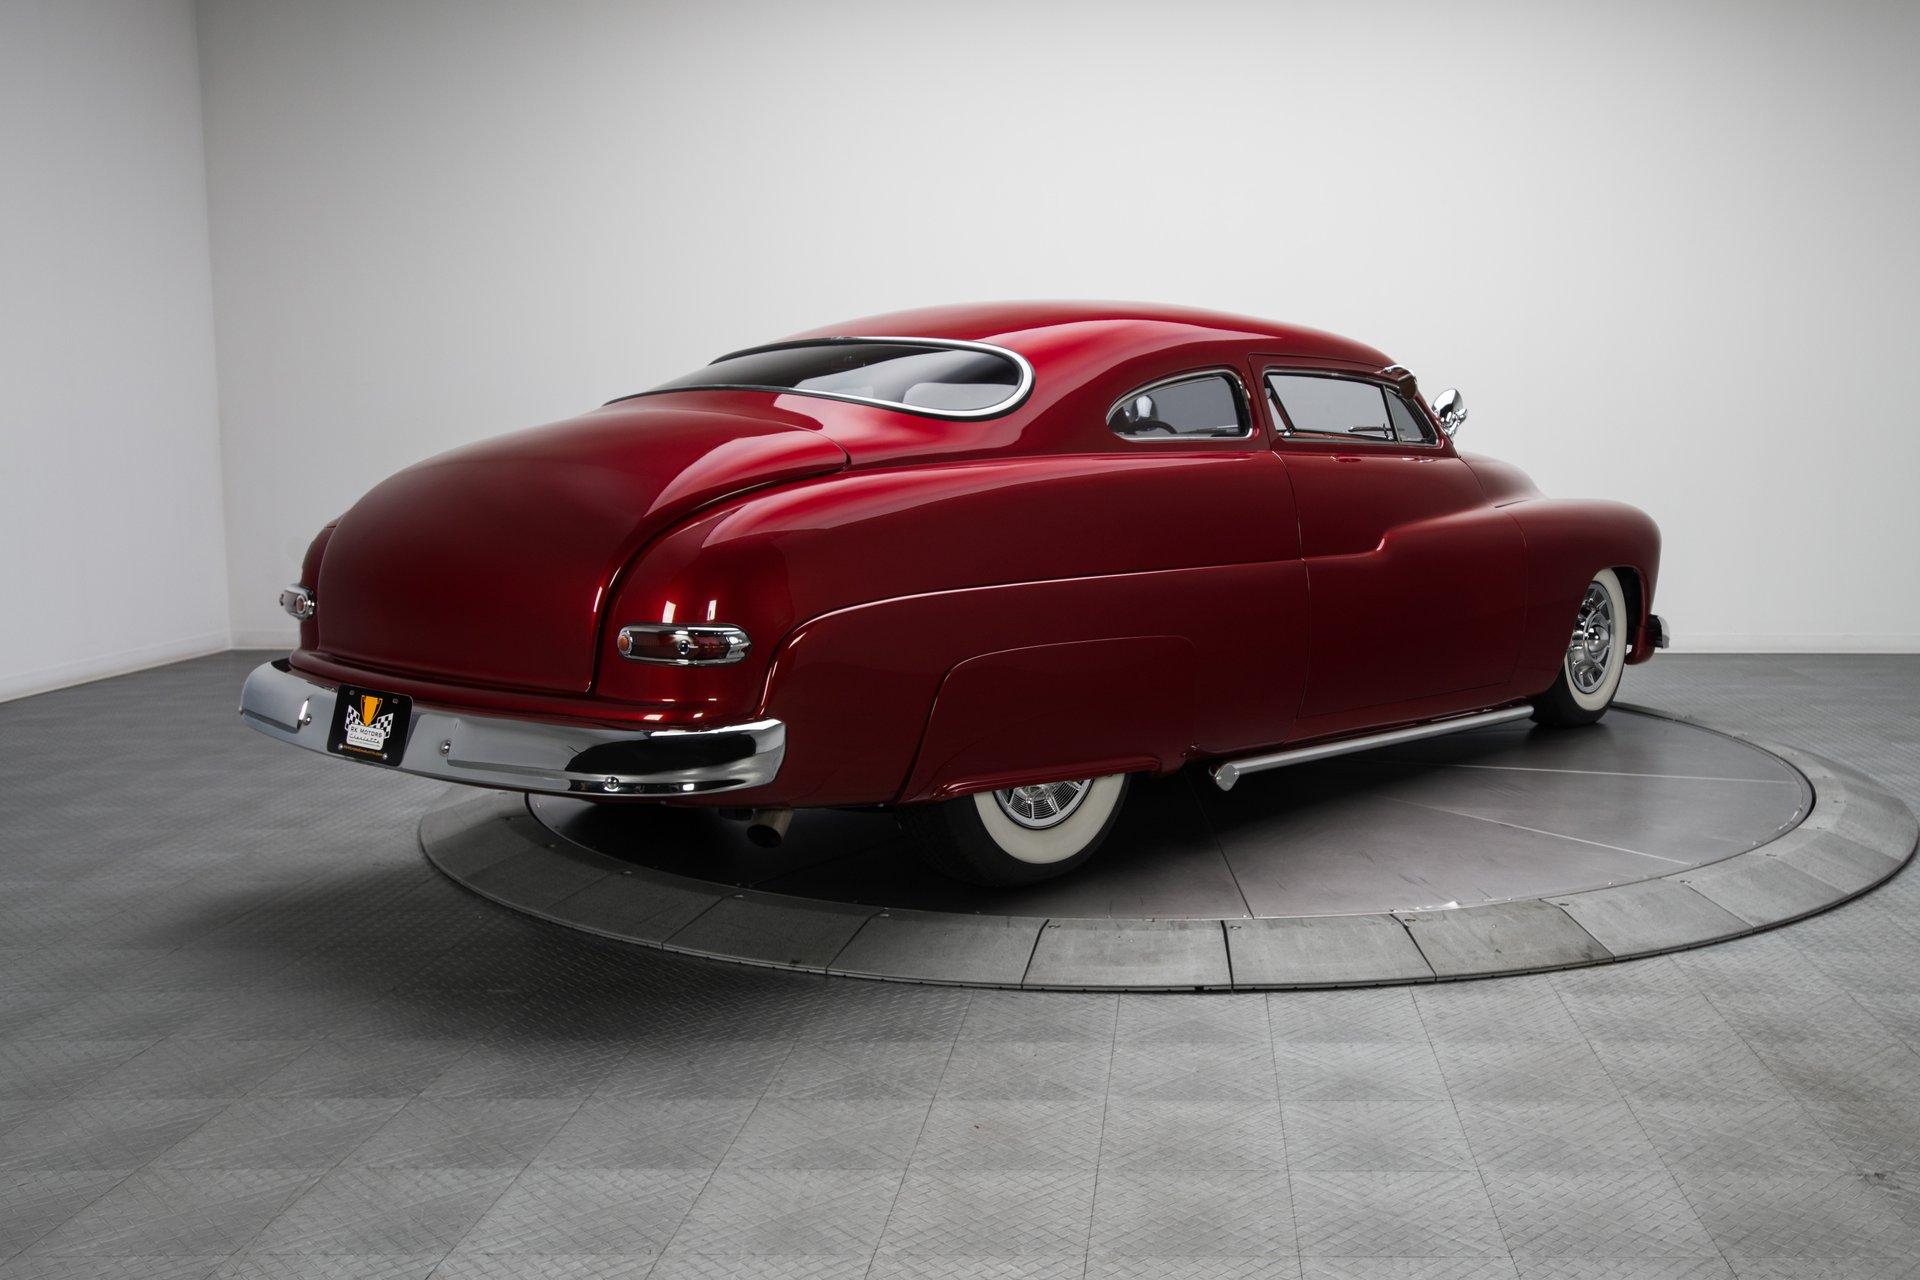 for sale 1950 mercury coupe for sale 1950 mercury coupe